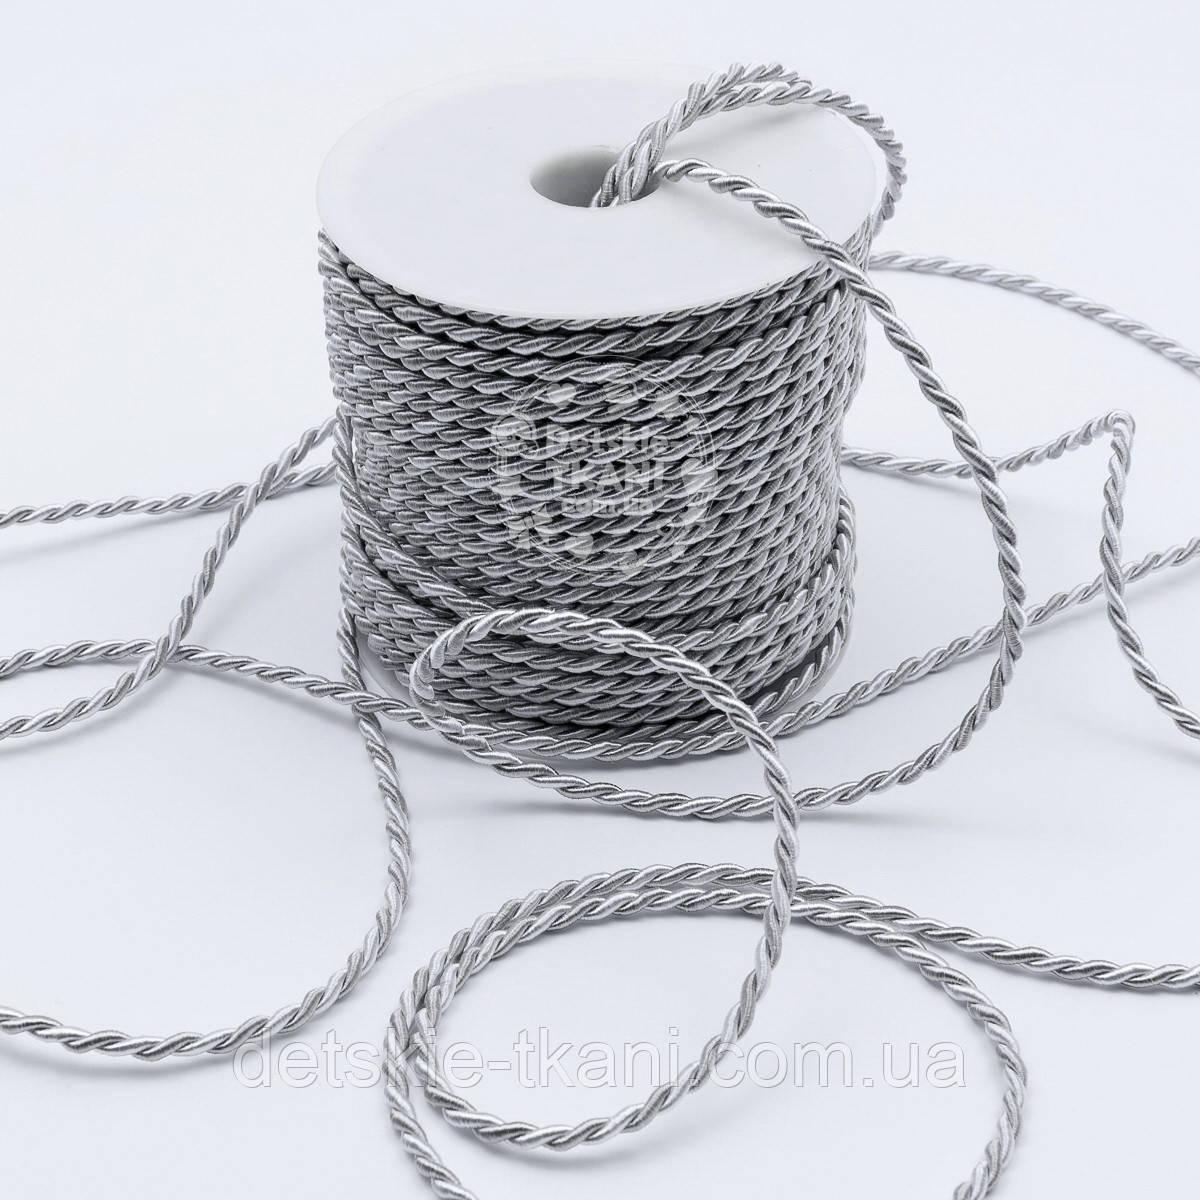 Шнур декоративный двух оттенков серебристого цвета, шириной 3 мм